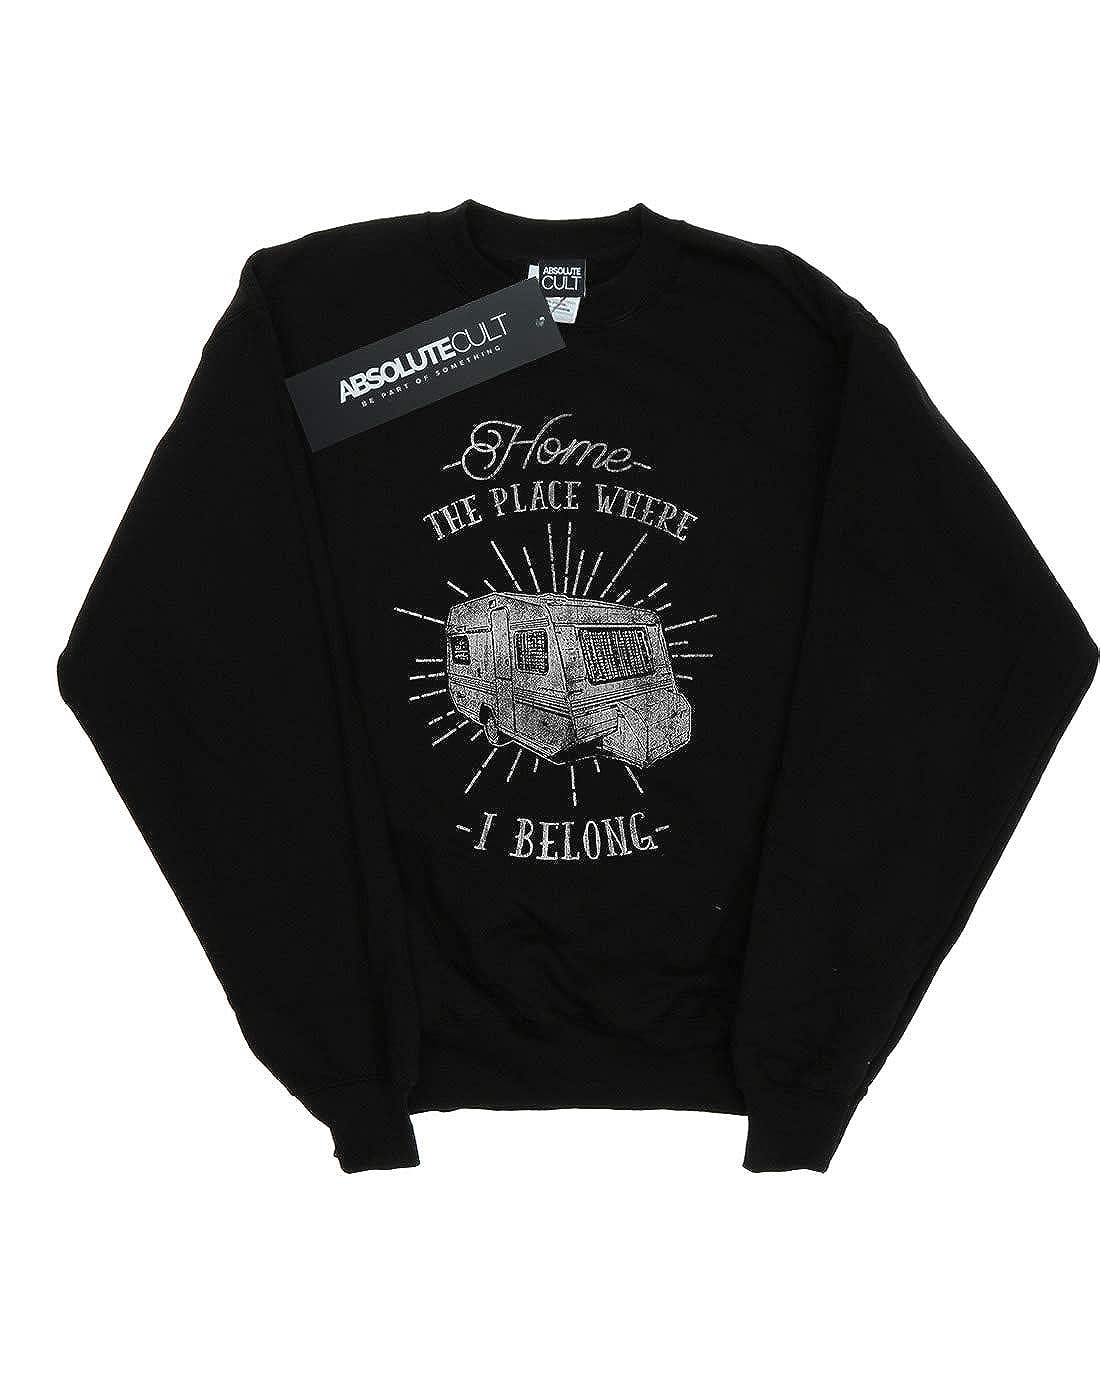 Absolute Cult Drewbacca Womens Home Where I Belong Sweatshirt